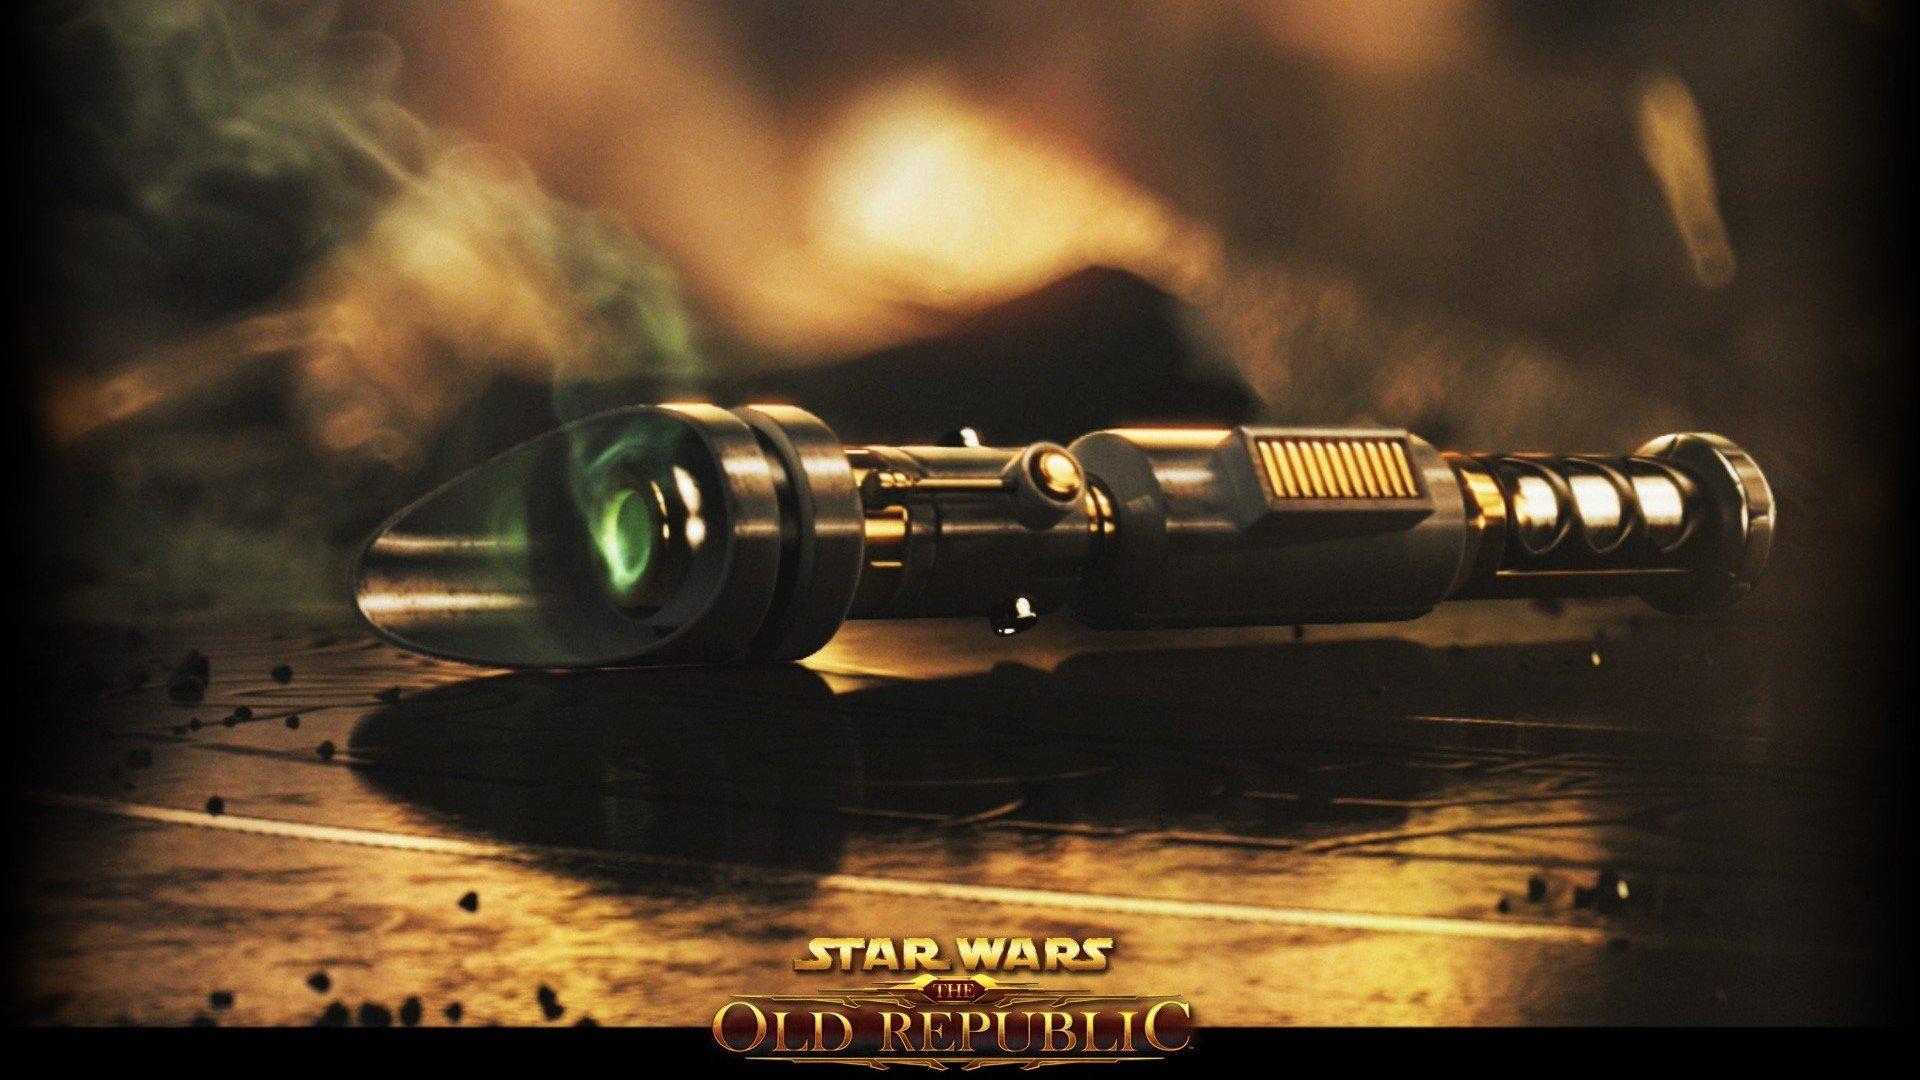 star wars old republic sci fi futuristic action fighting